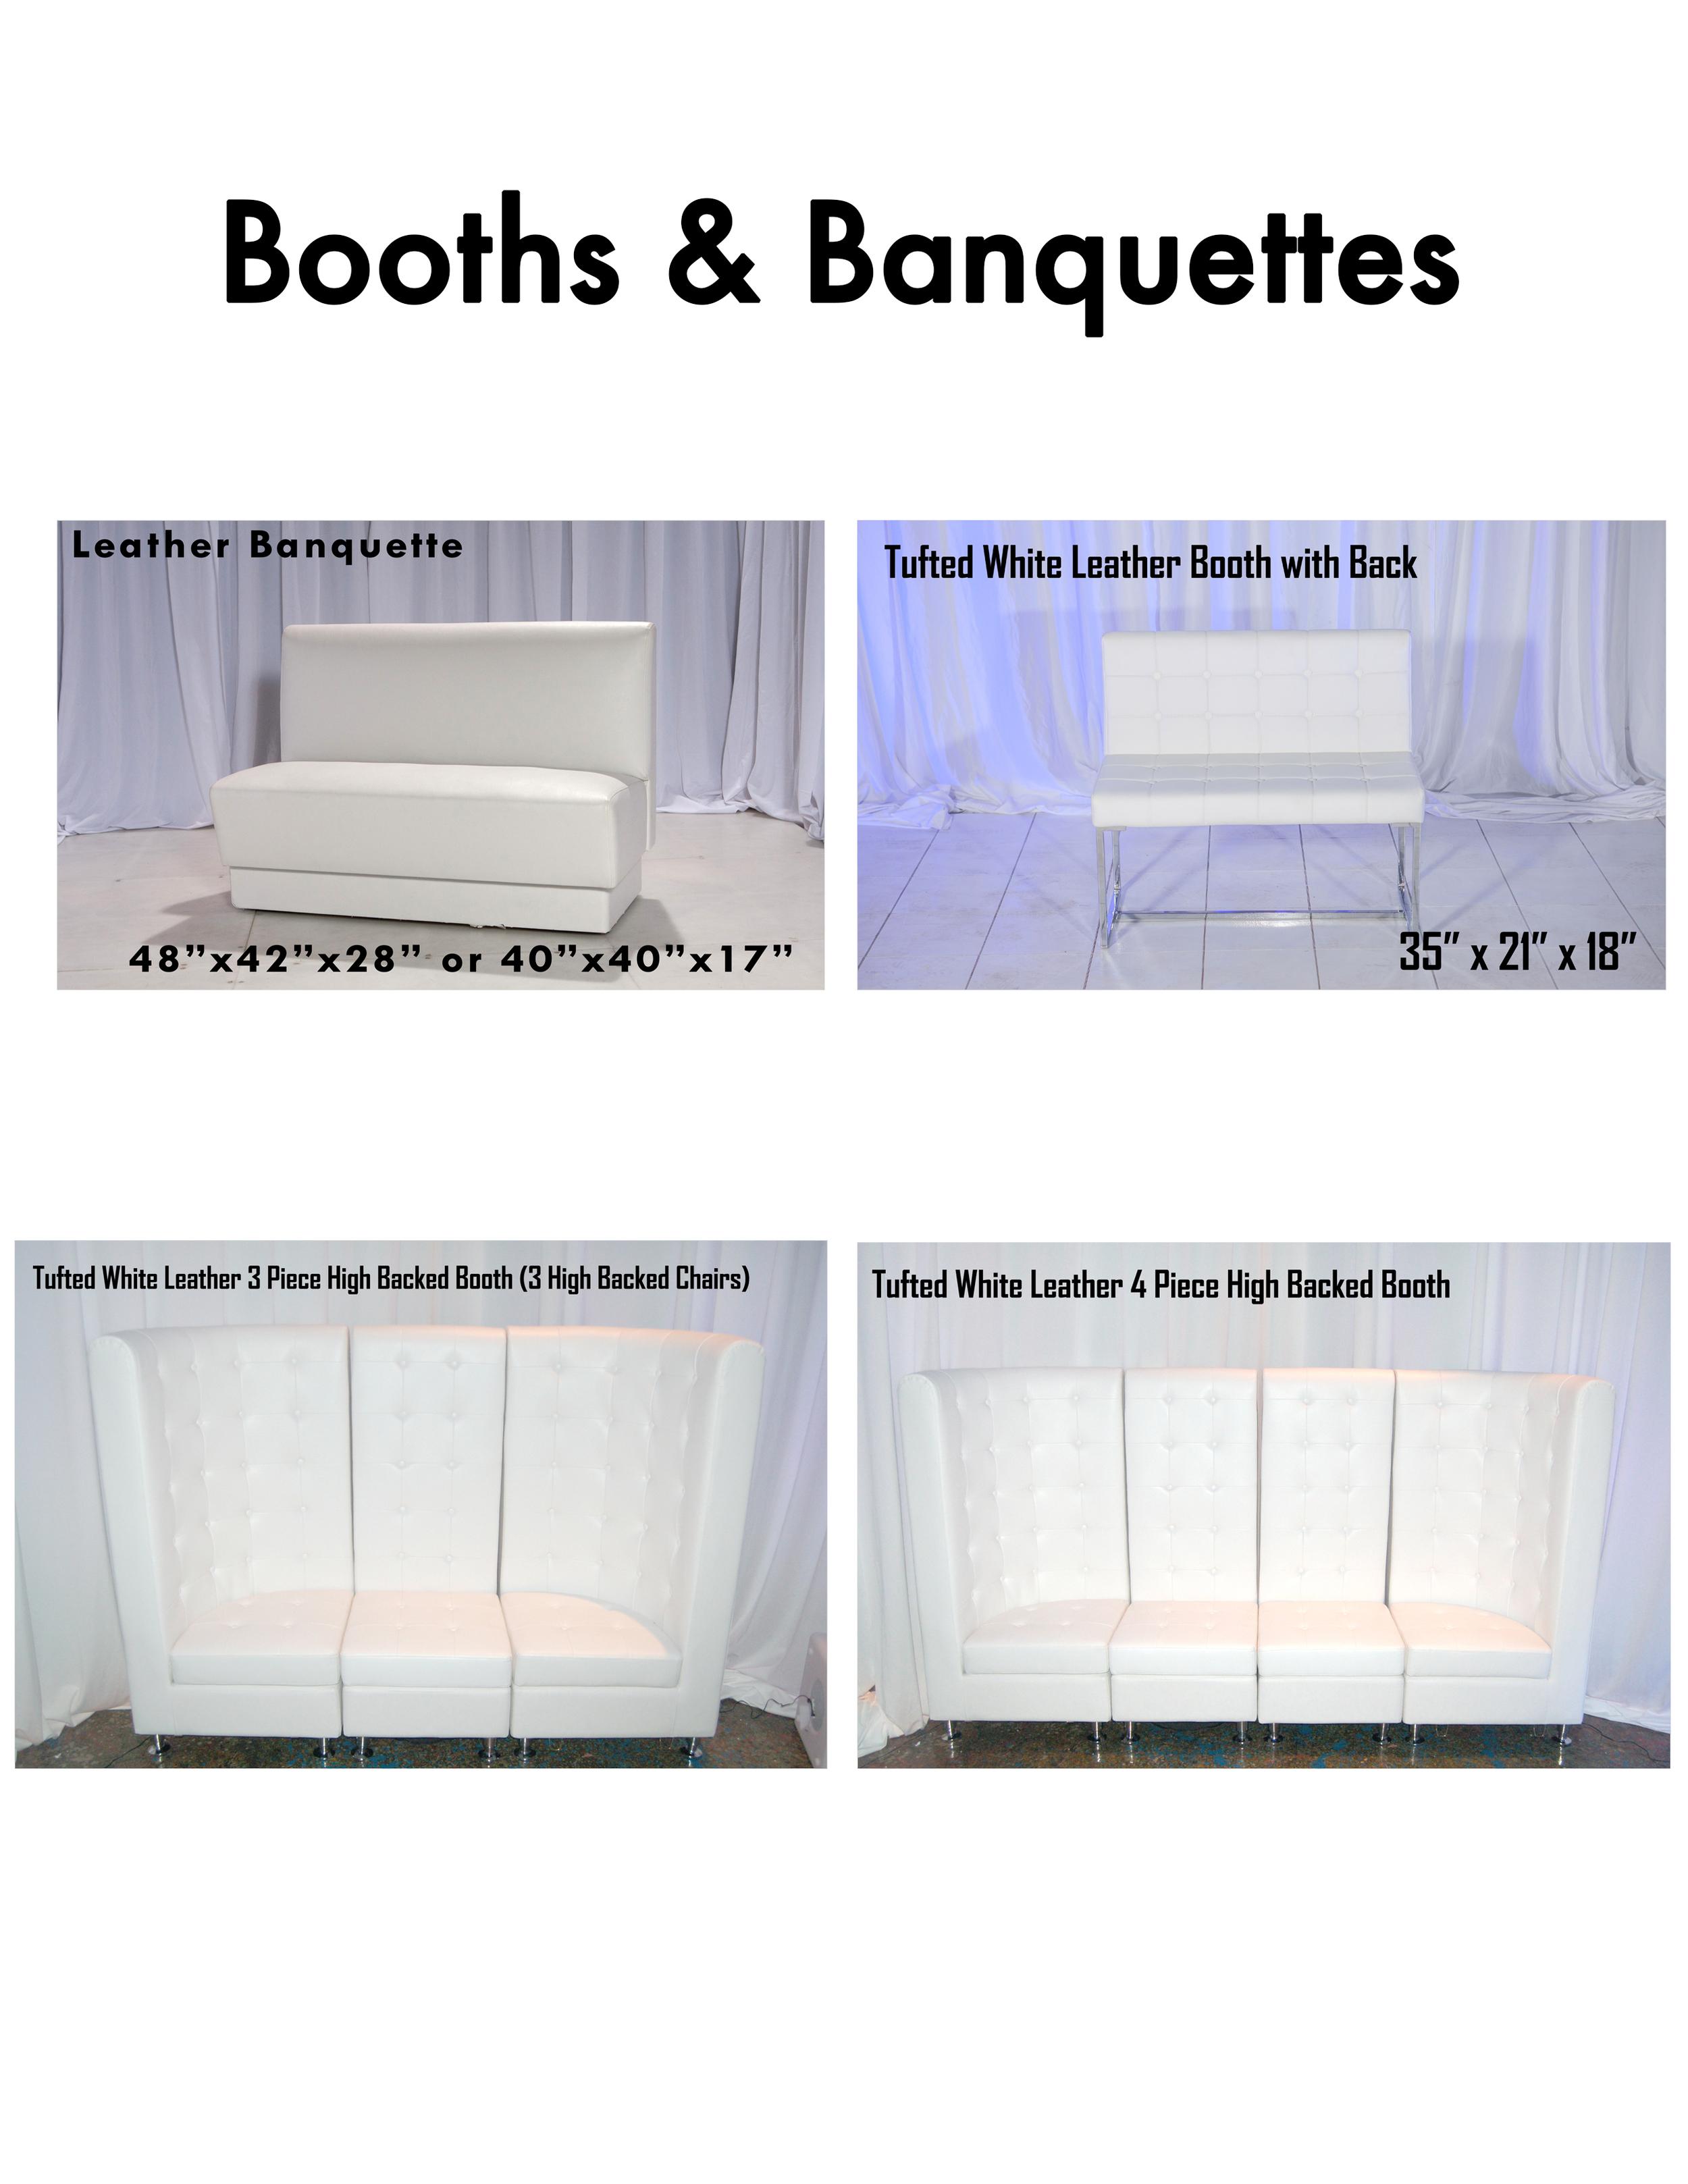 P38_Booths & Banquettes.jpg